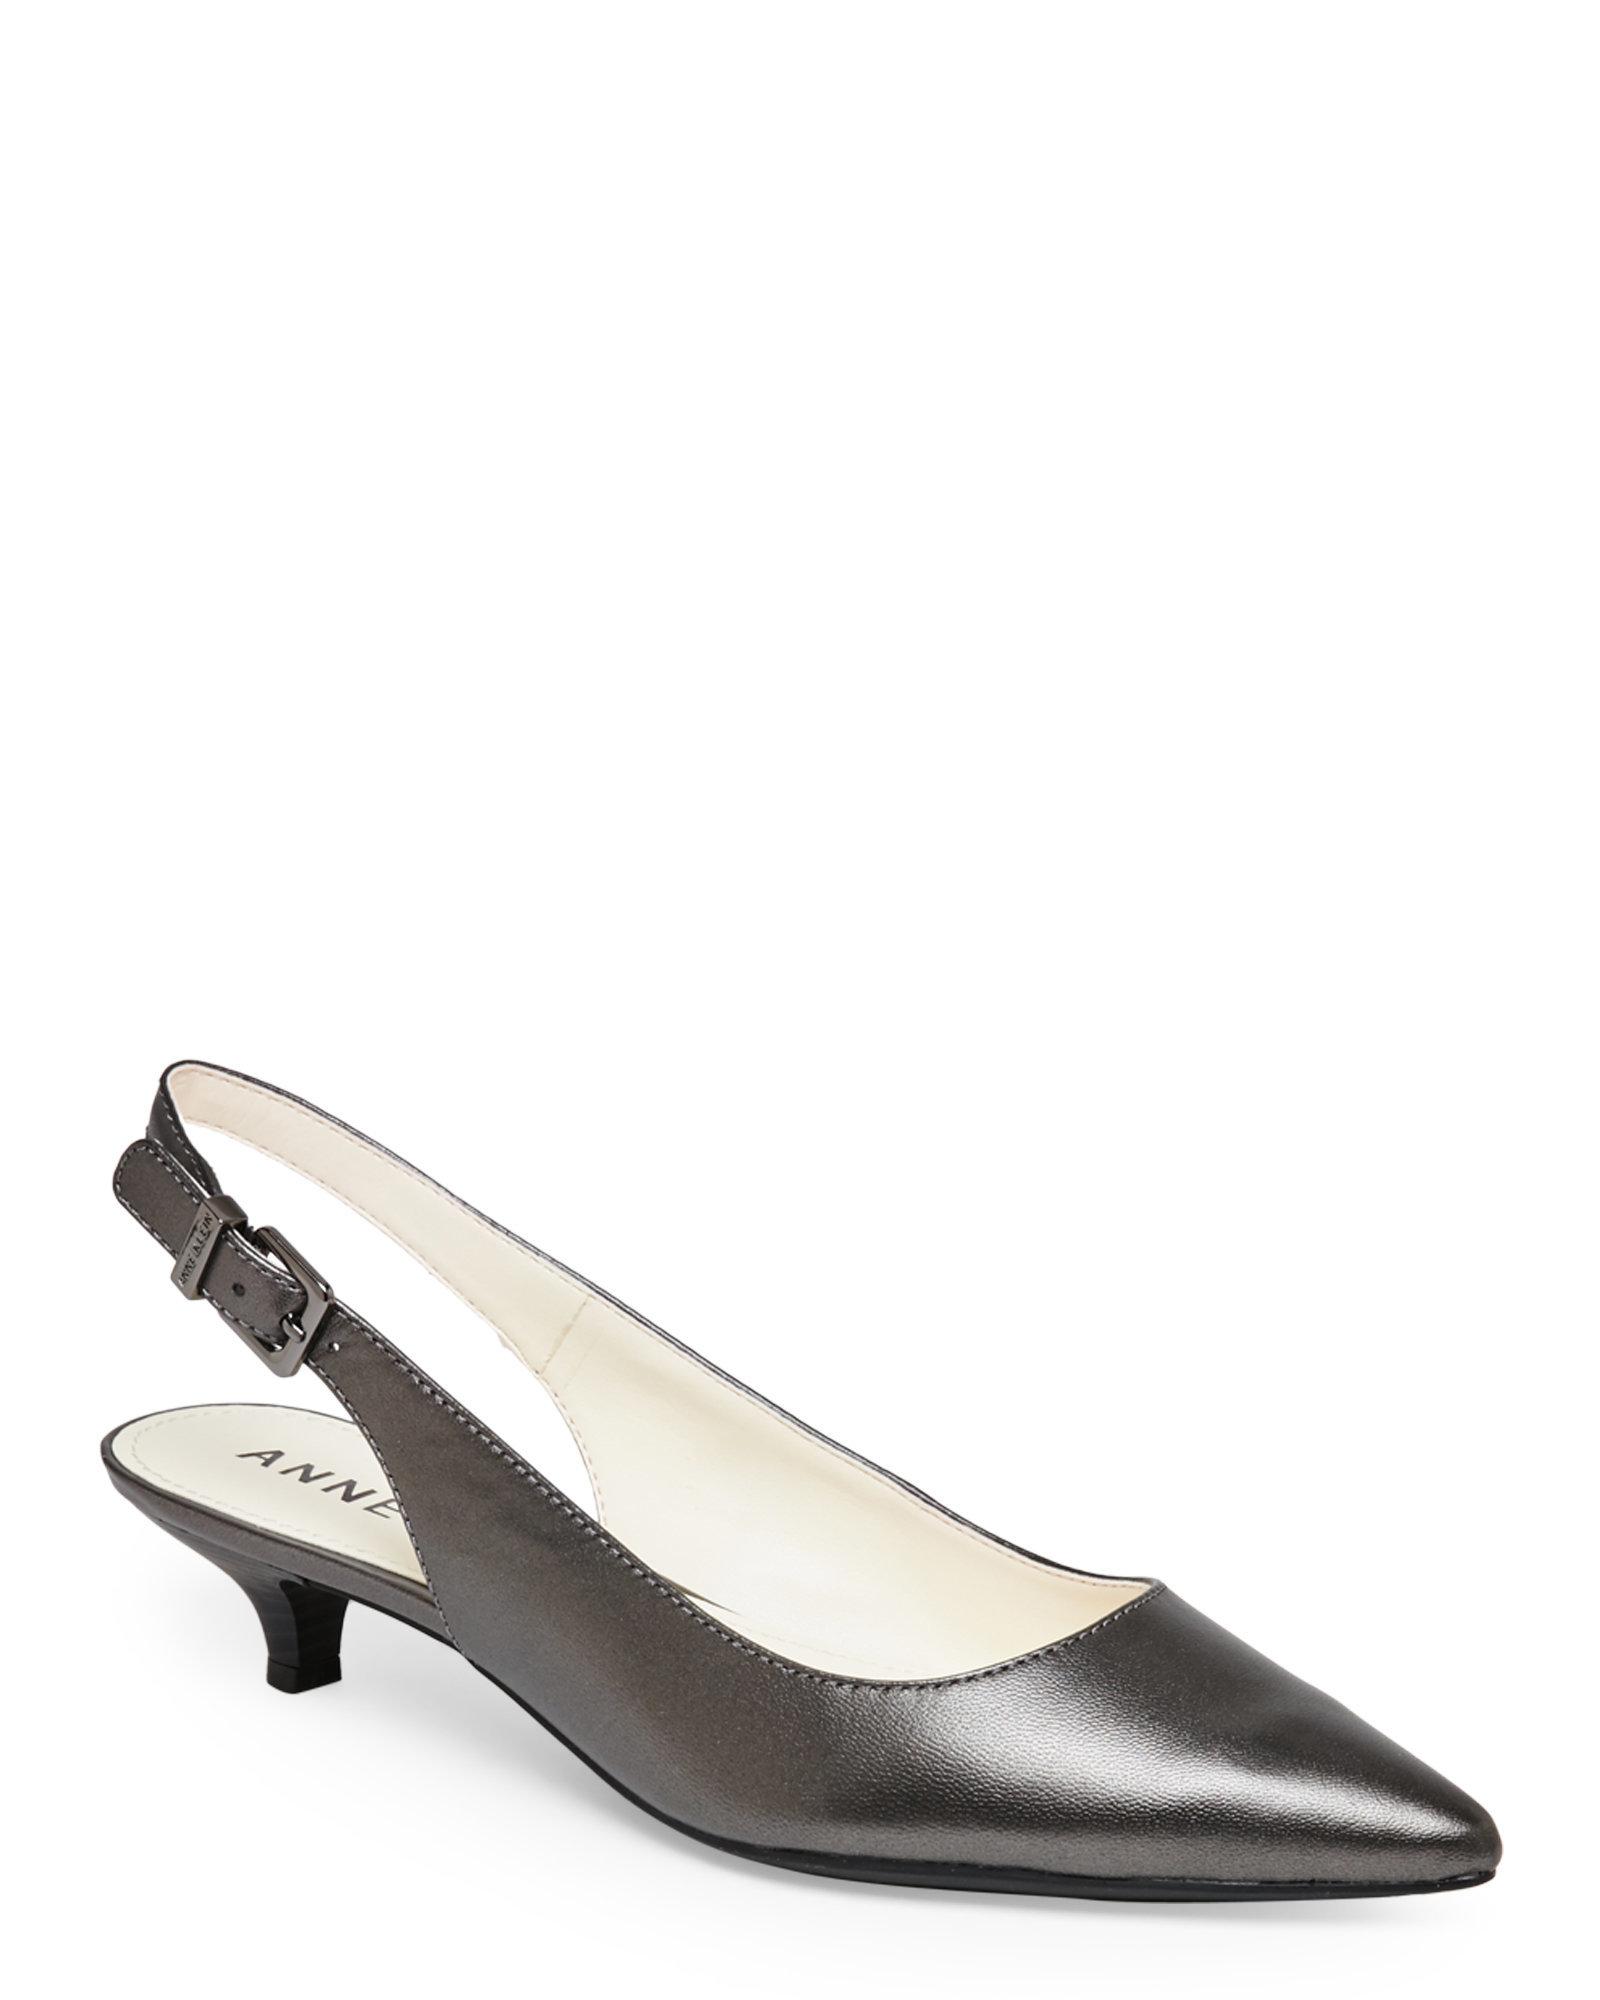 Anne Klein Pewter Expert Pointed Toe Low Heel Slingback